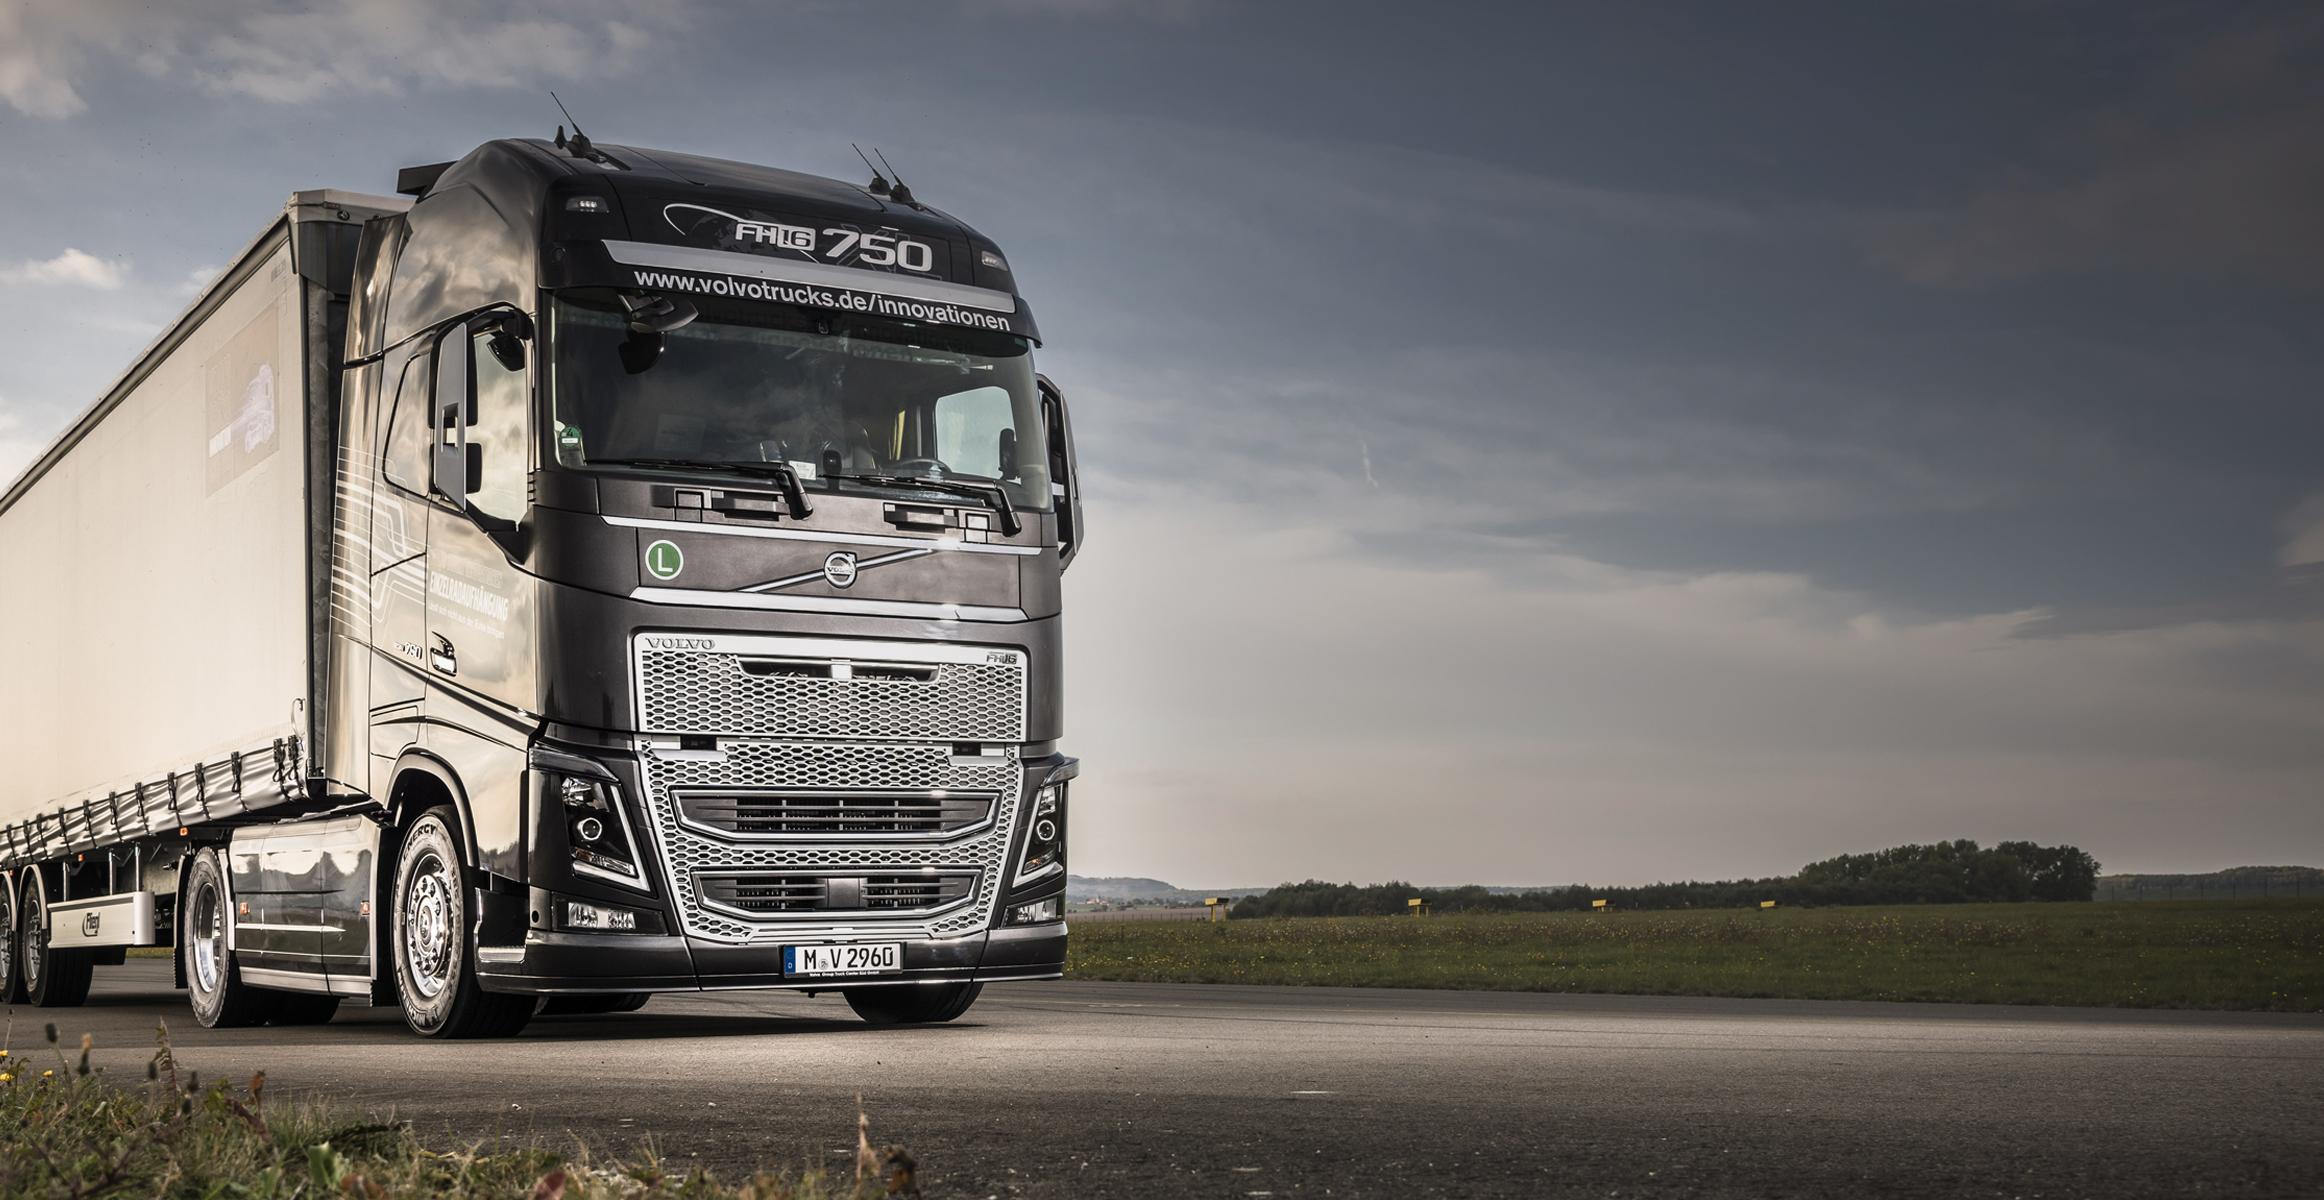 Volvo truck photo